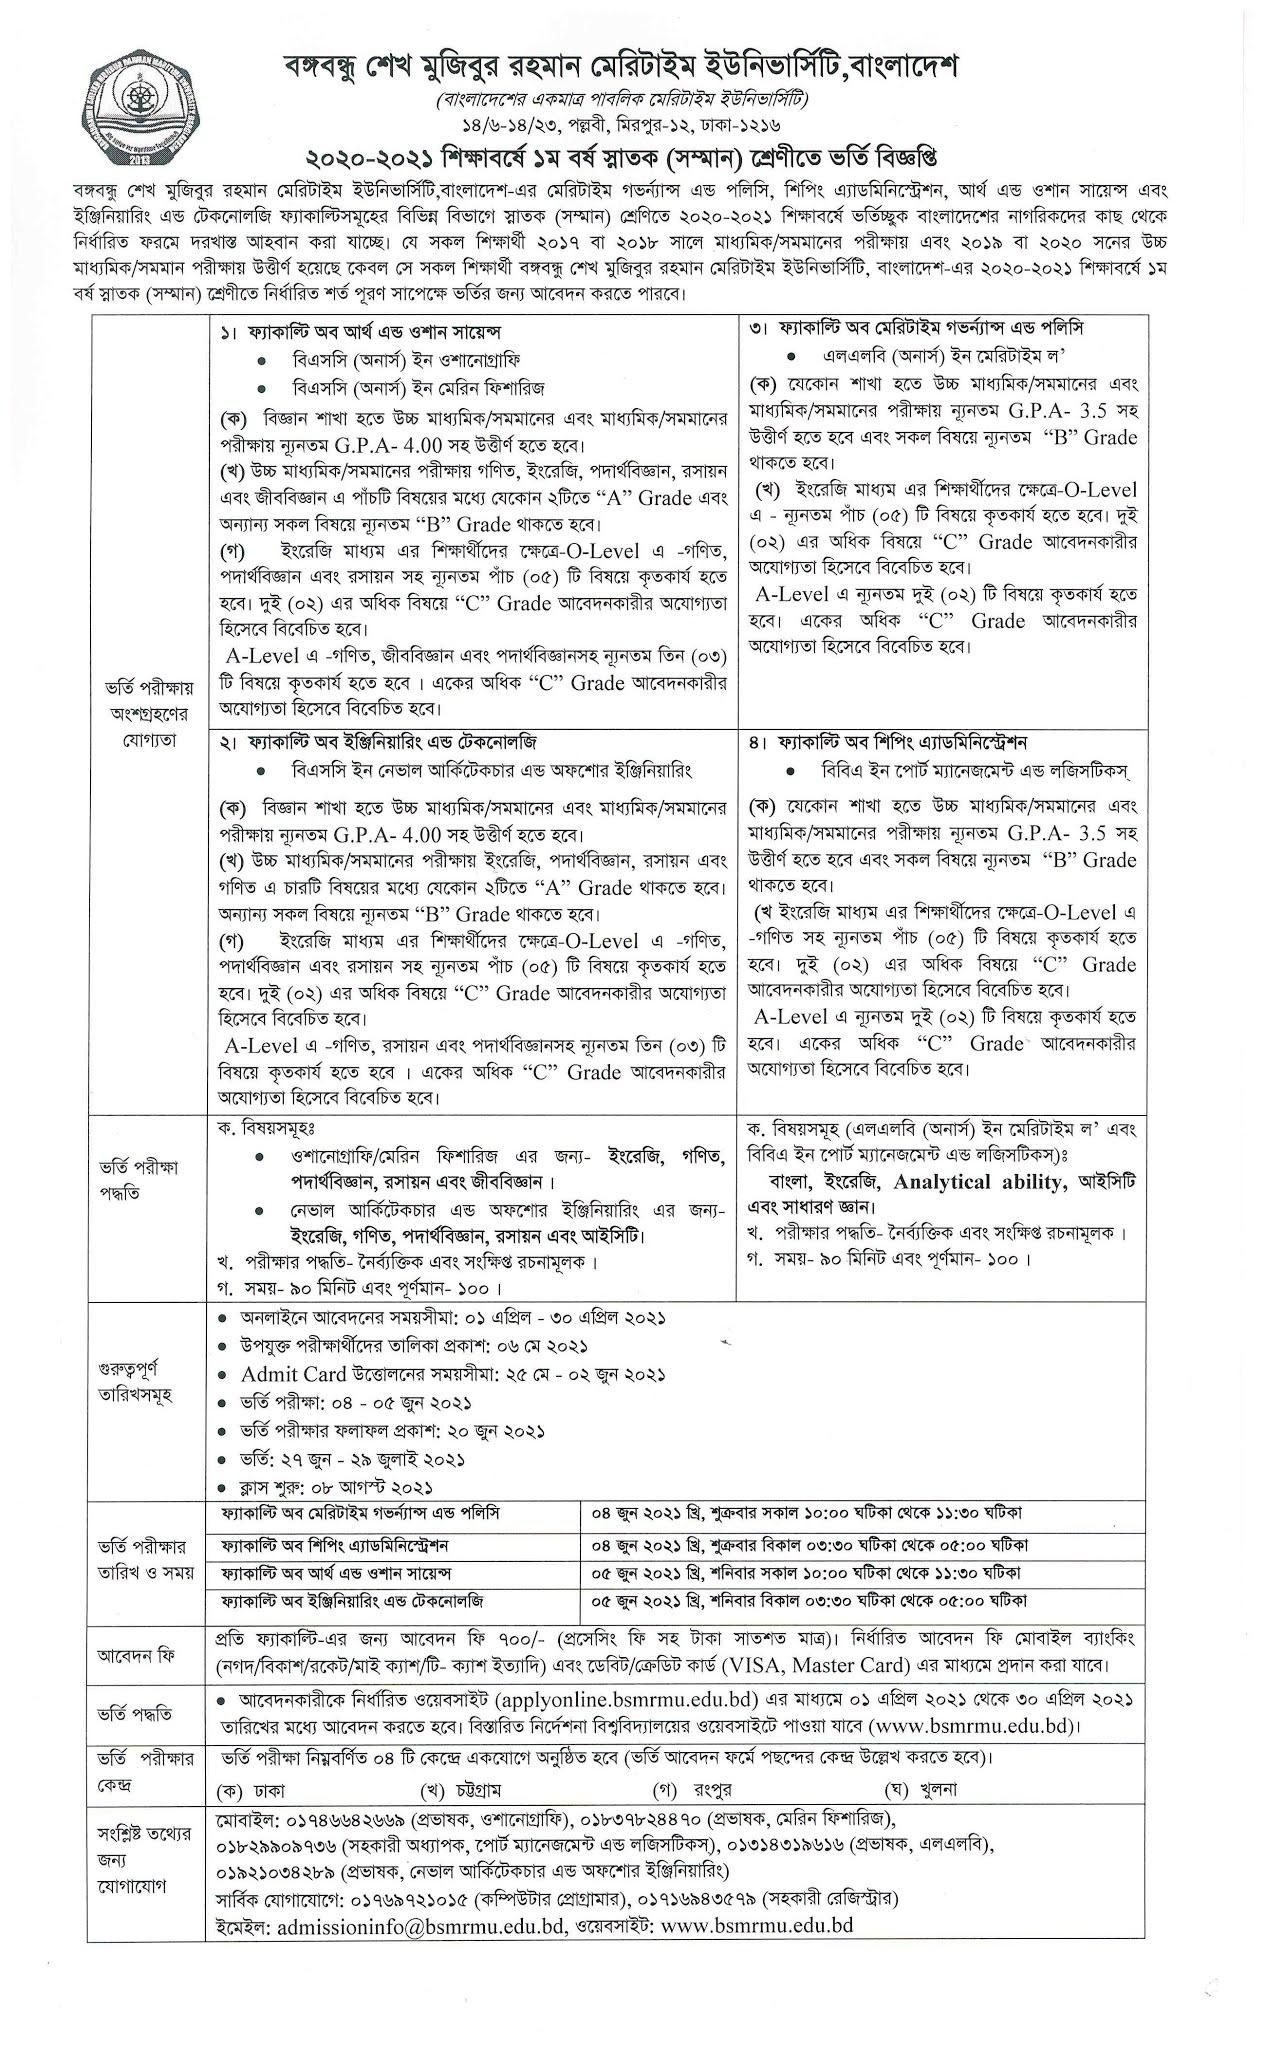 Maritime University Admission Circular 2021